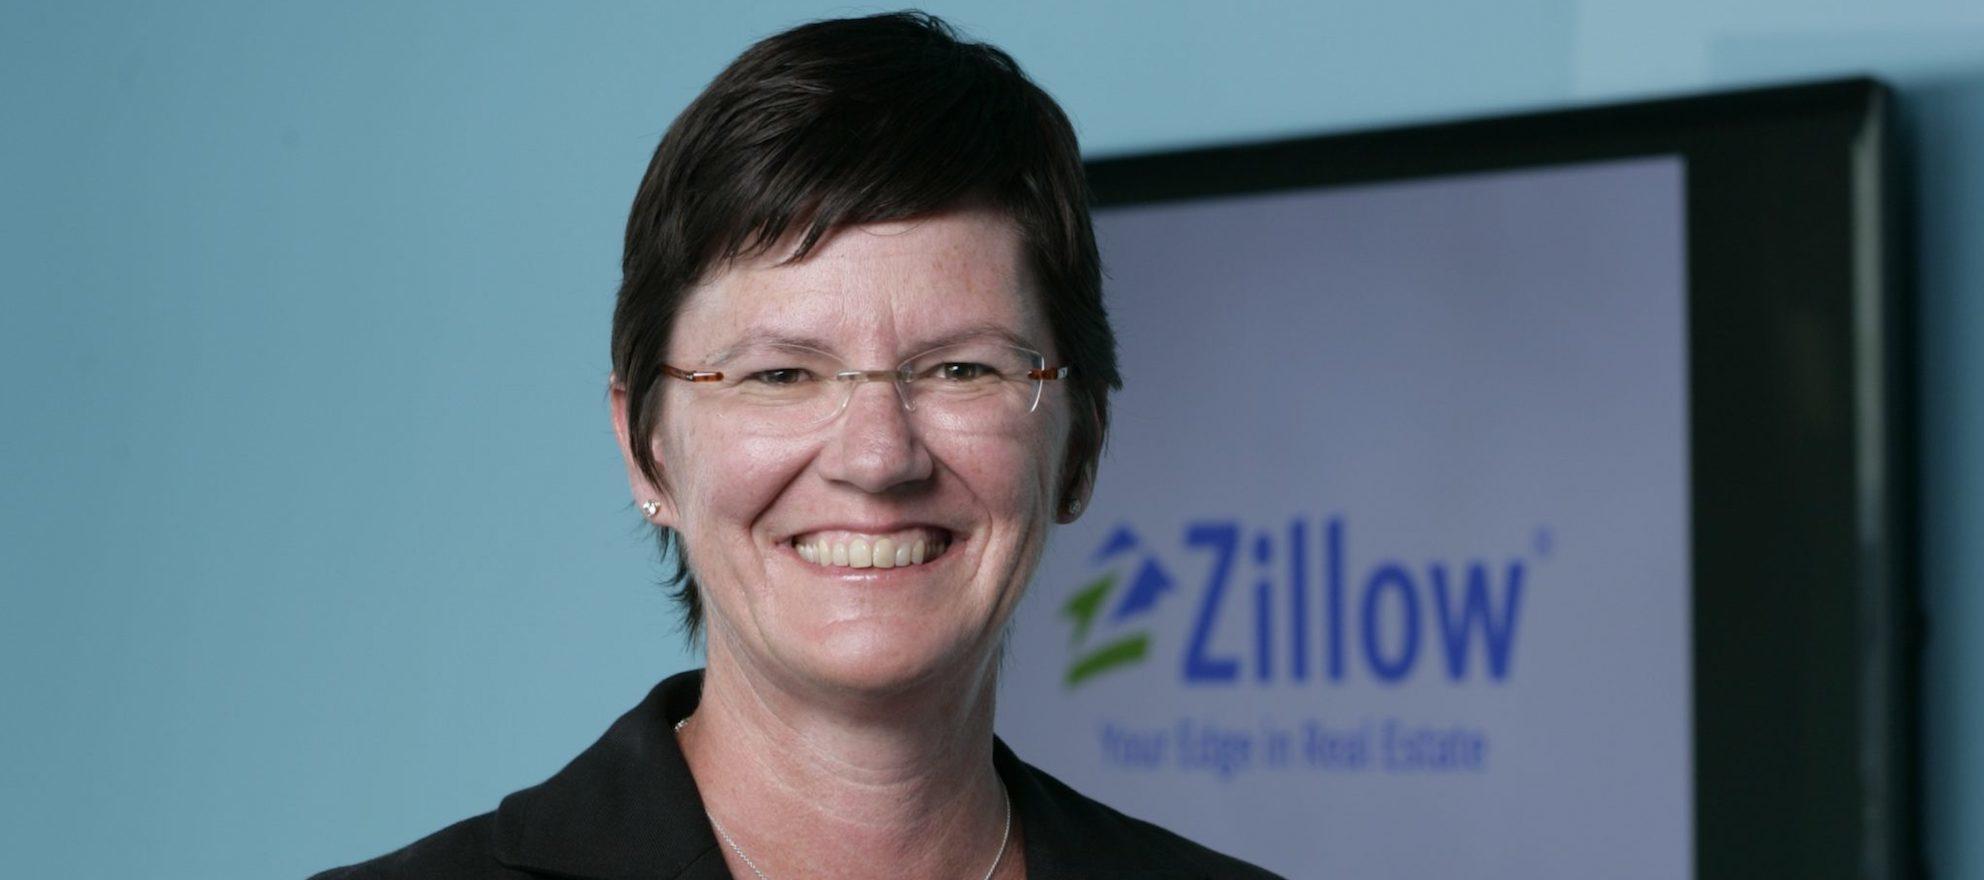 Zillow Group CFO Kathleen Philips set to retire